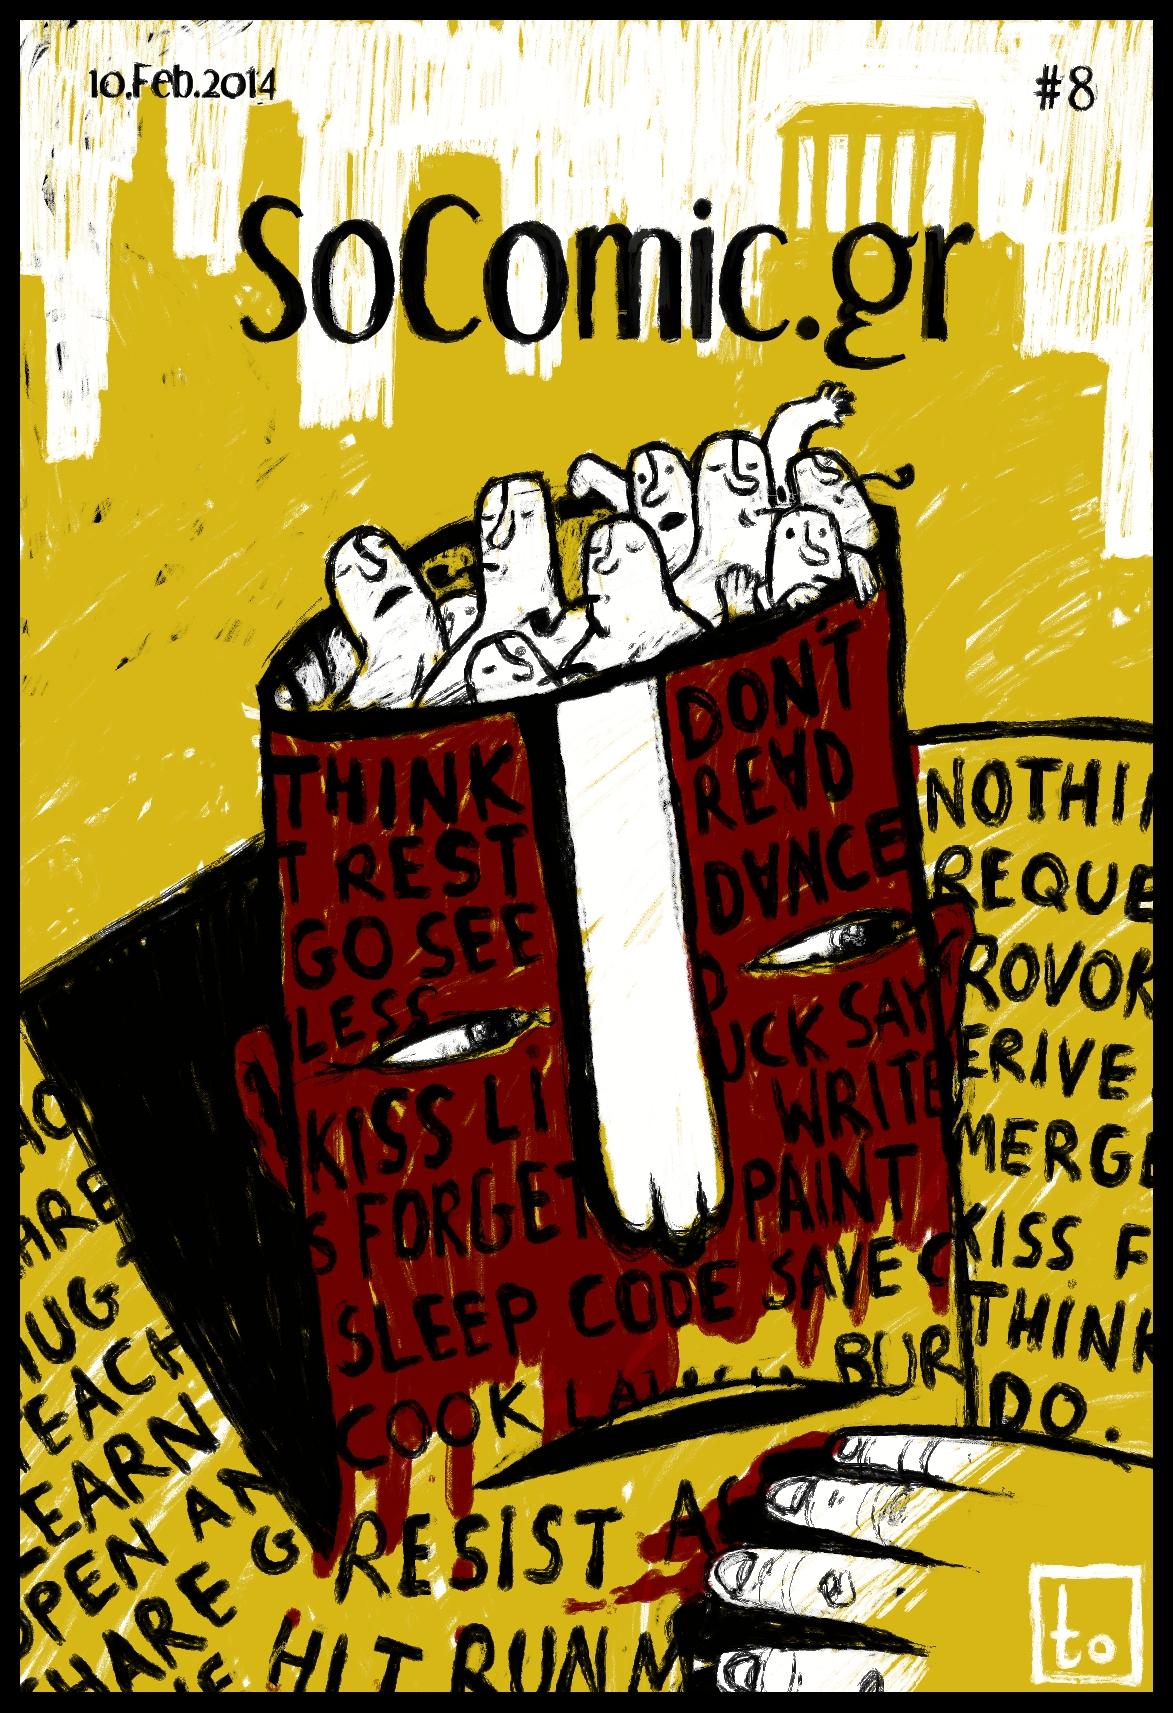 SoComic_Cover_Tautologos (1)